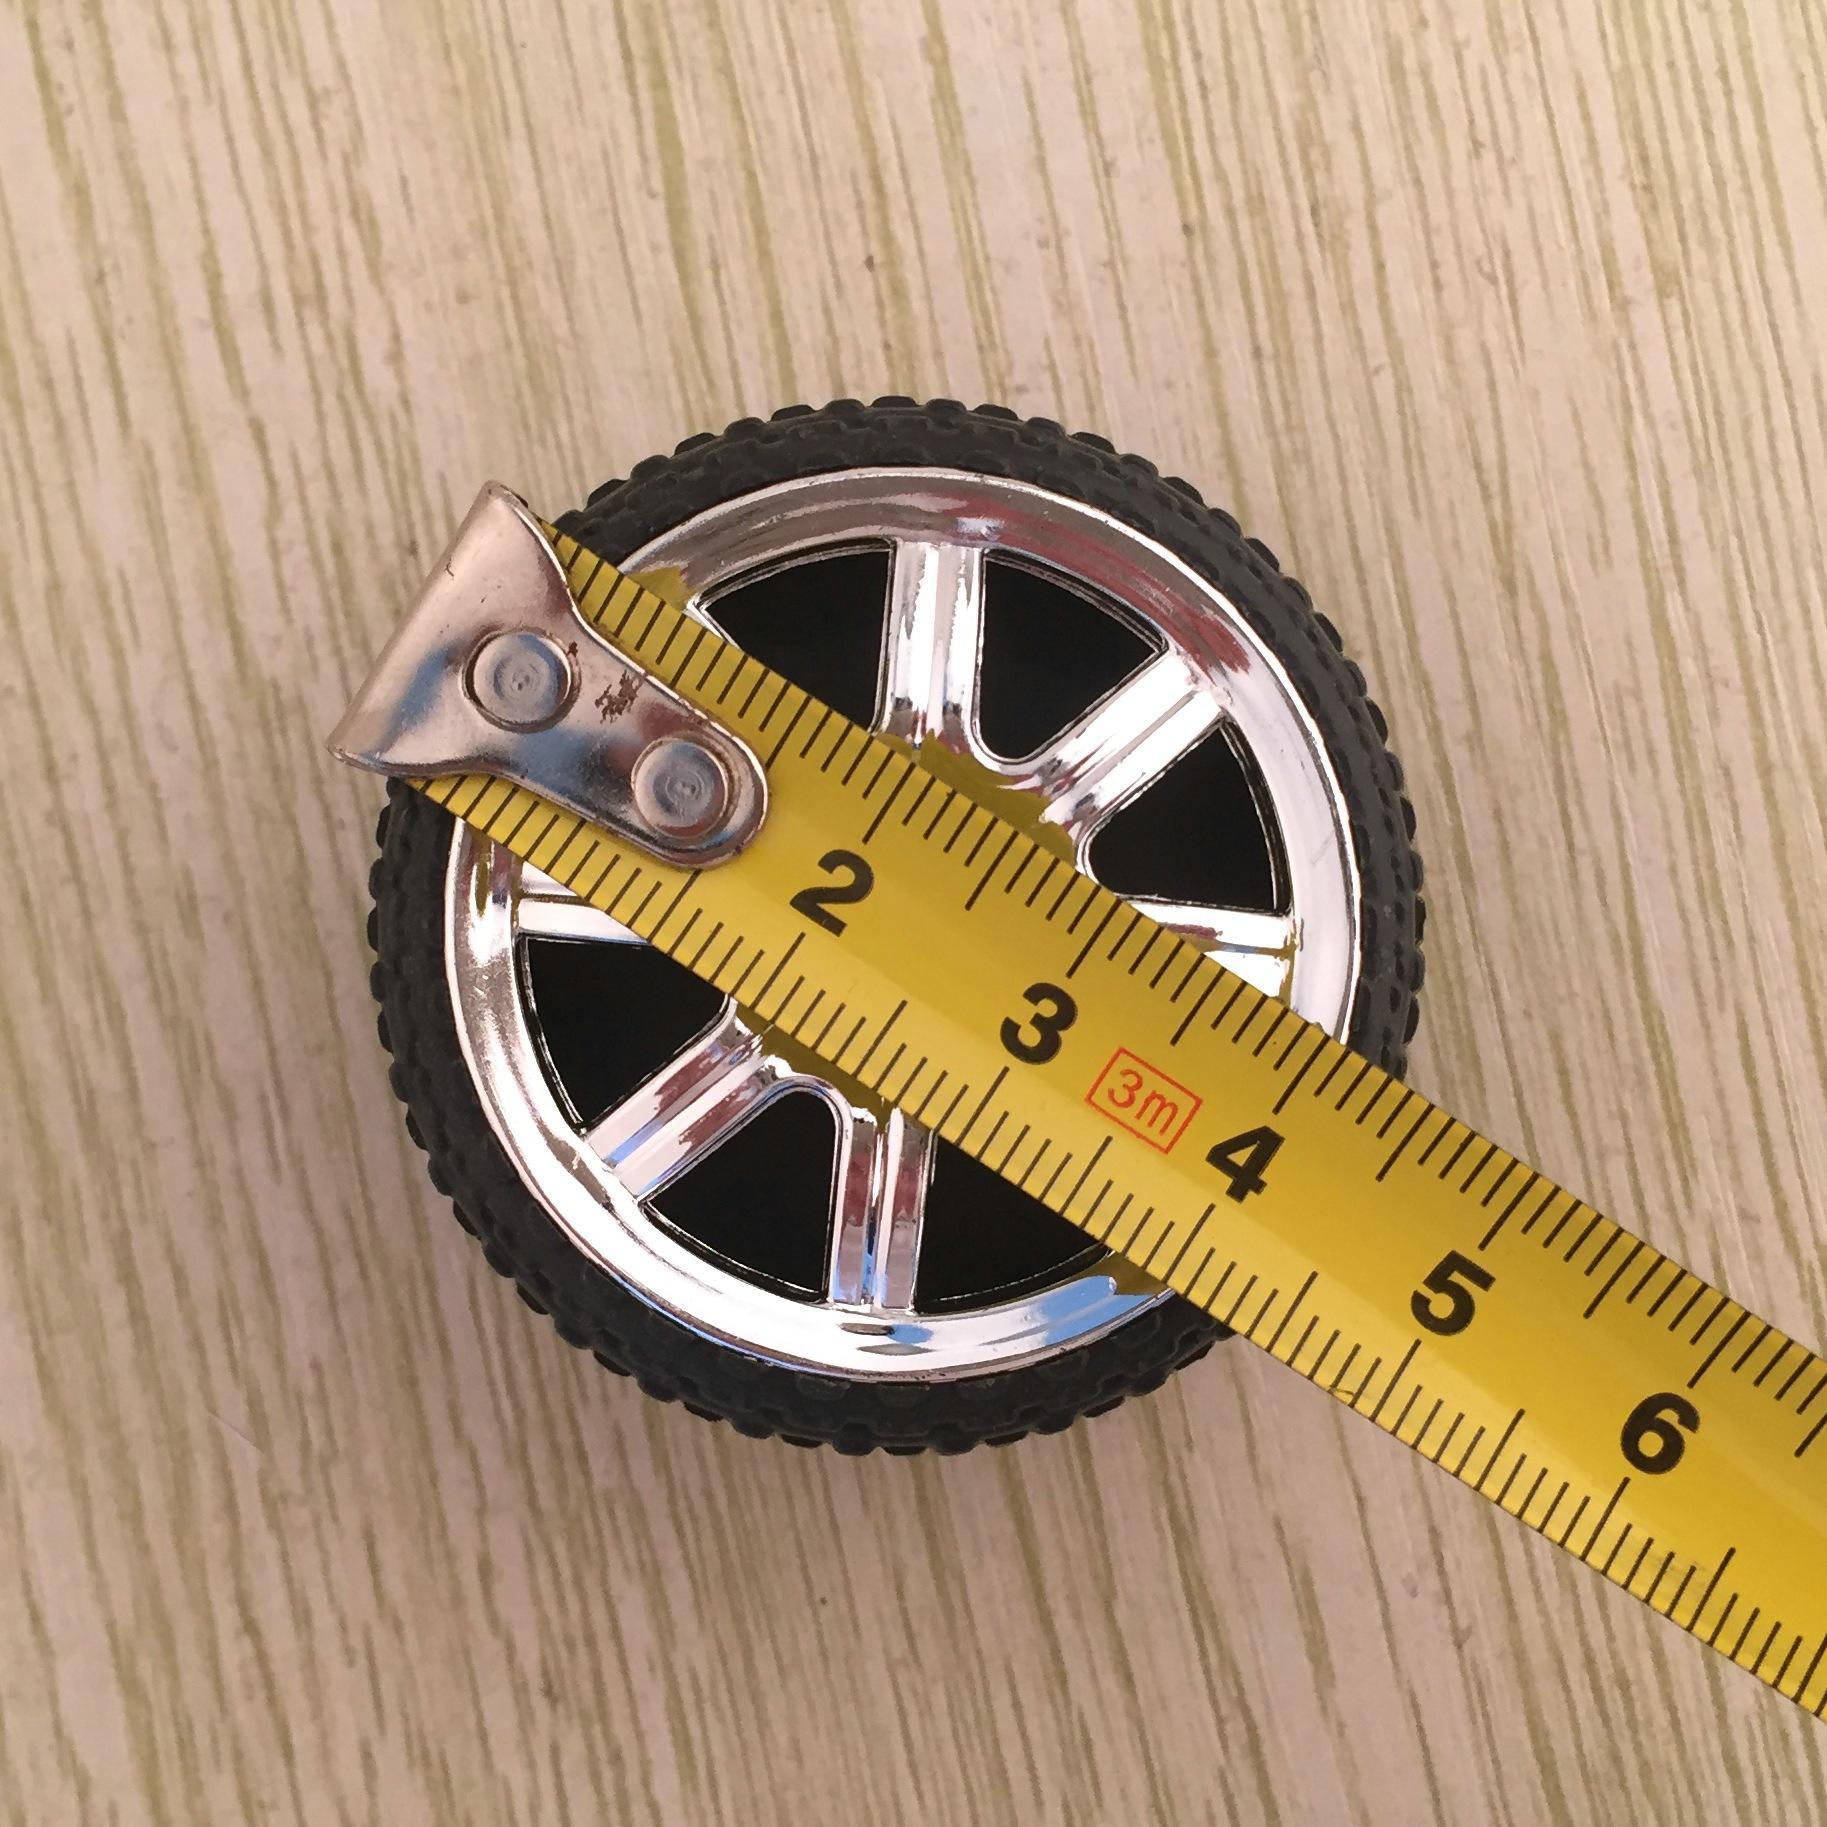 Gift classic traditional toys Plating wheel yo-yo yo-yo yoyo ball Traditional Toys / children's toys / hot /